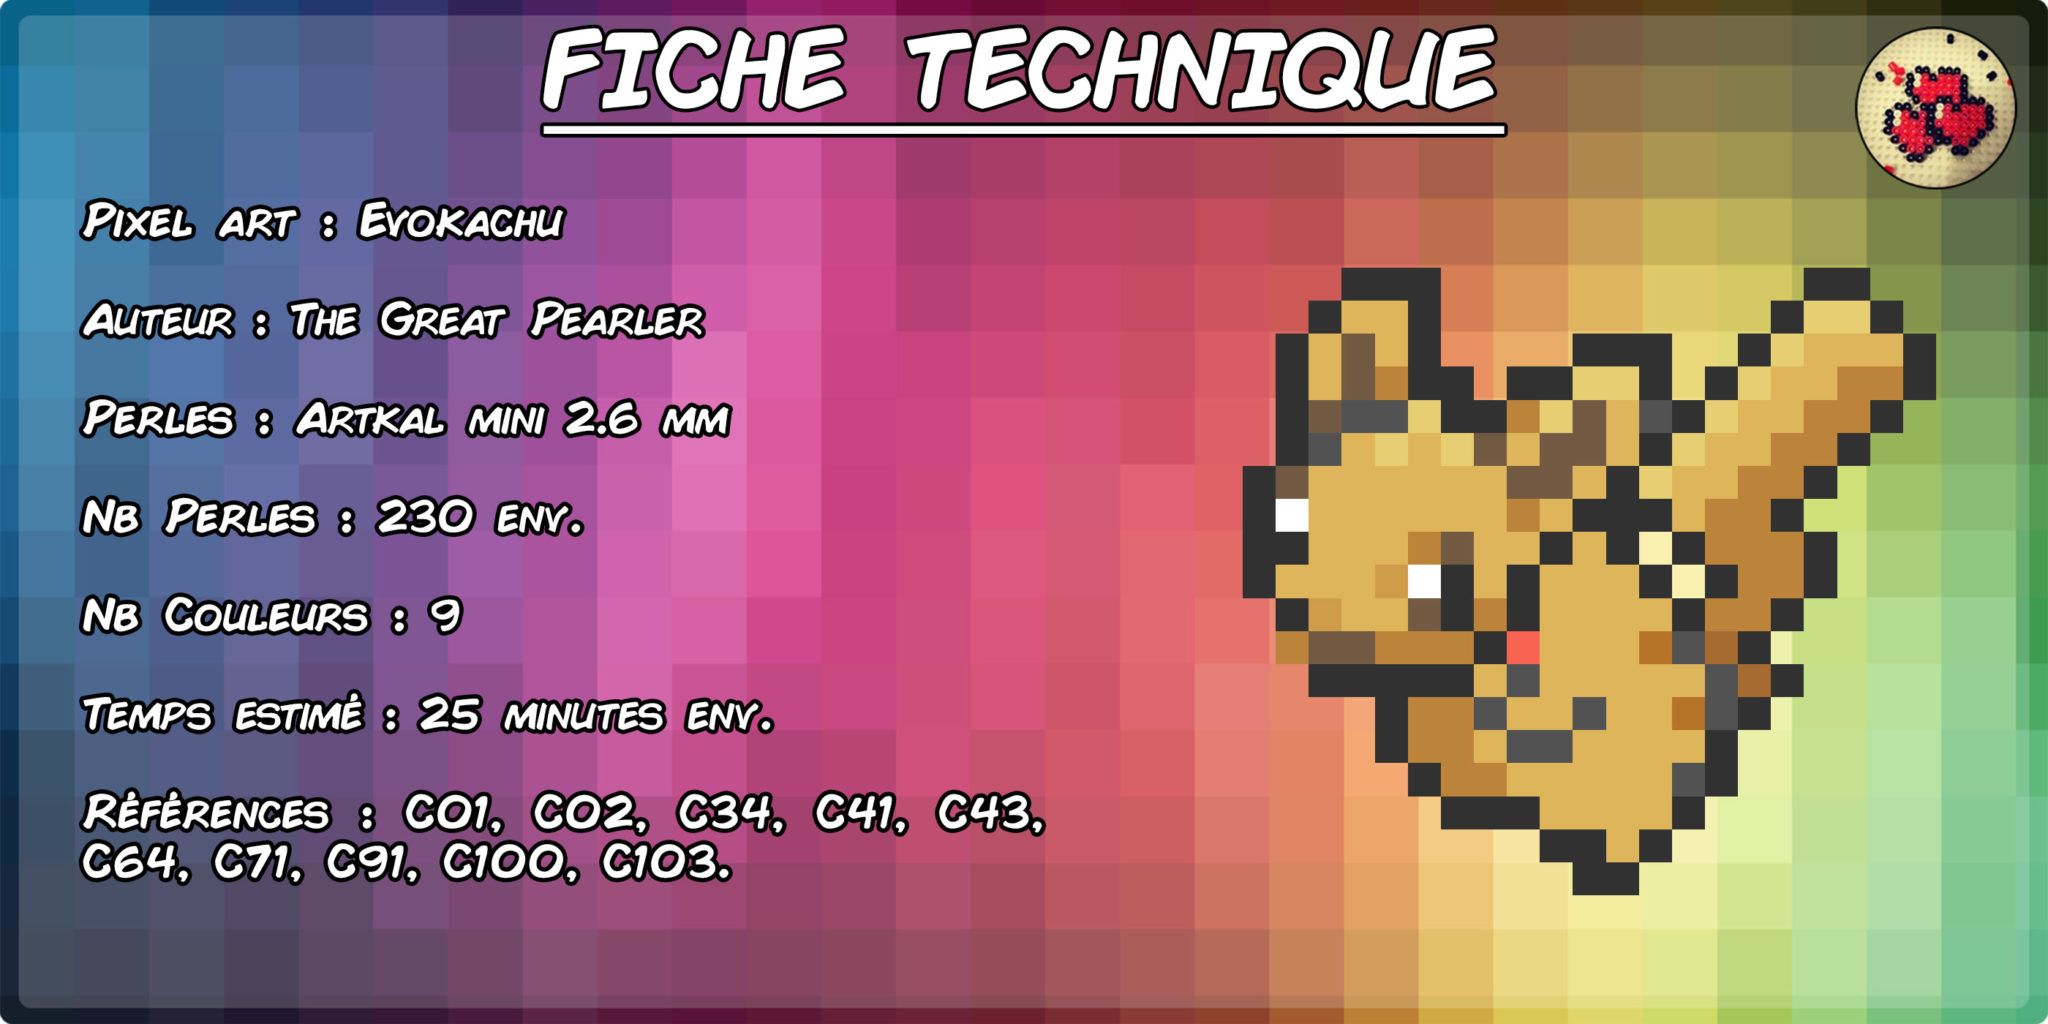 evoli-pikachu-evokachu-fiche-pokefusion-pokemon-pixel-card-pixelart-pixelcraft-pixelbeads-perlerbeads-perlerart-hama-hamabeads-hamasprites-artkal-artkalbeads-fusebeads-retro-gaming-sprite-design-tutoriel